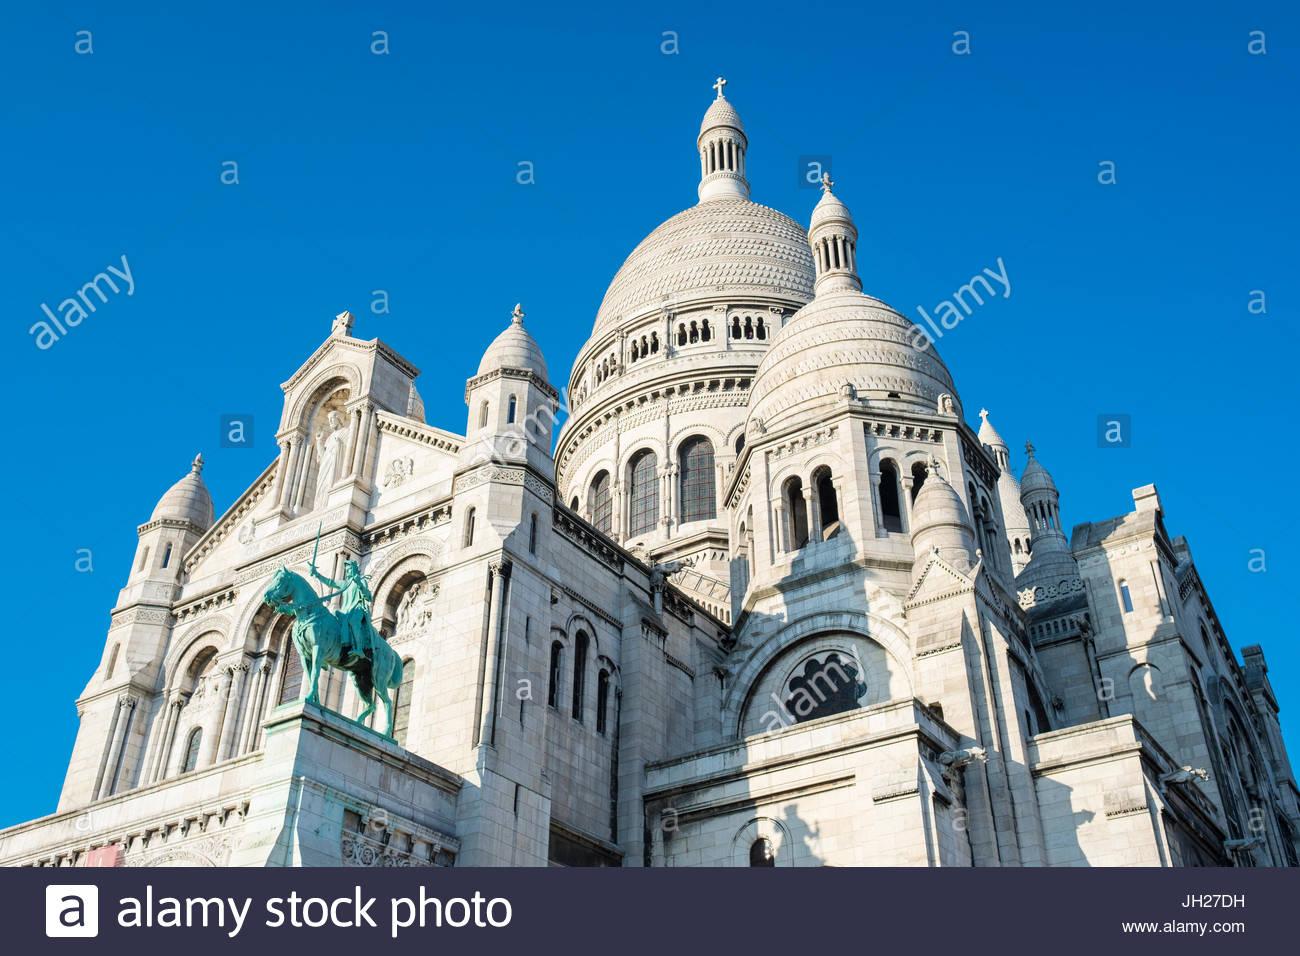 Basilica of Sacre Coeur, Montmartre, Paris, France, Europe - Stock Image